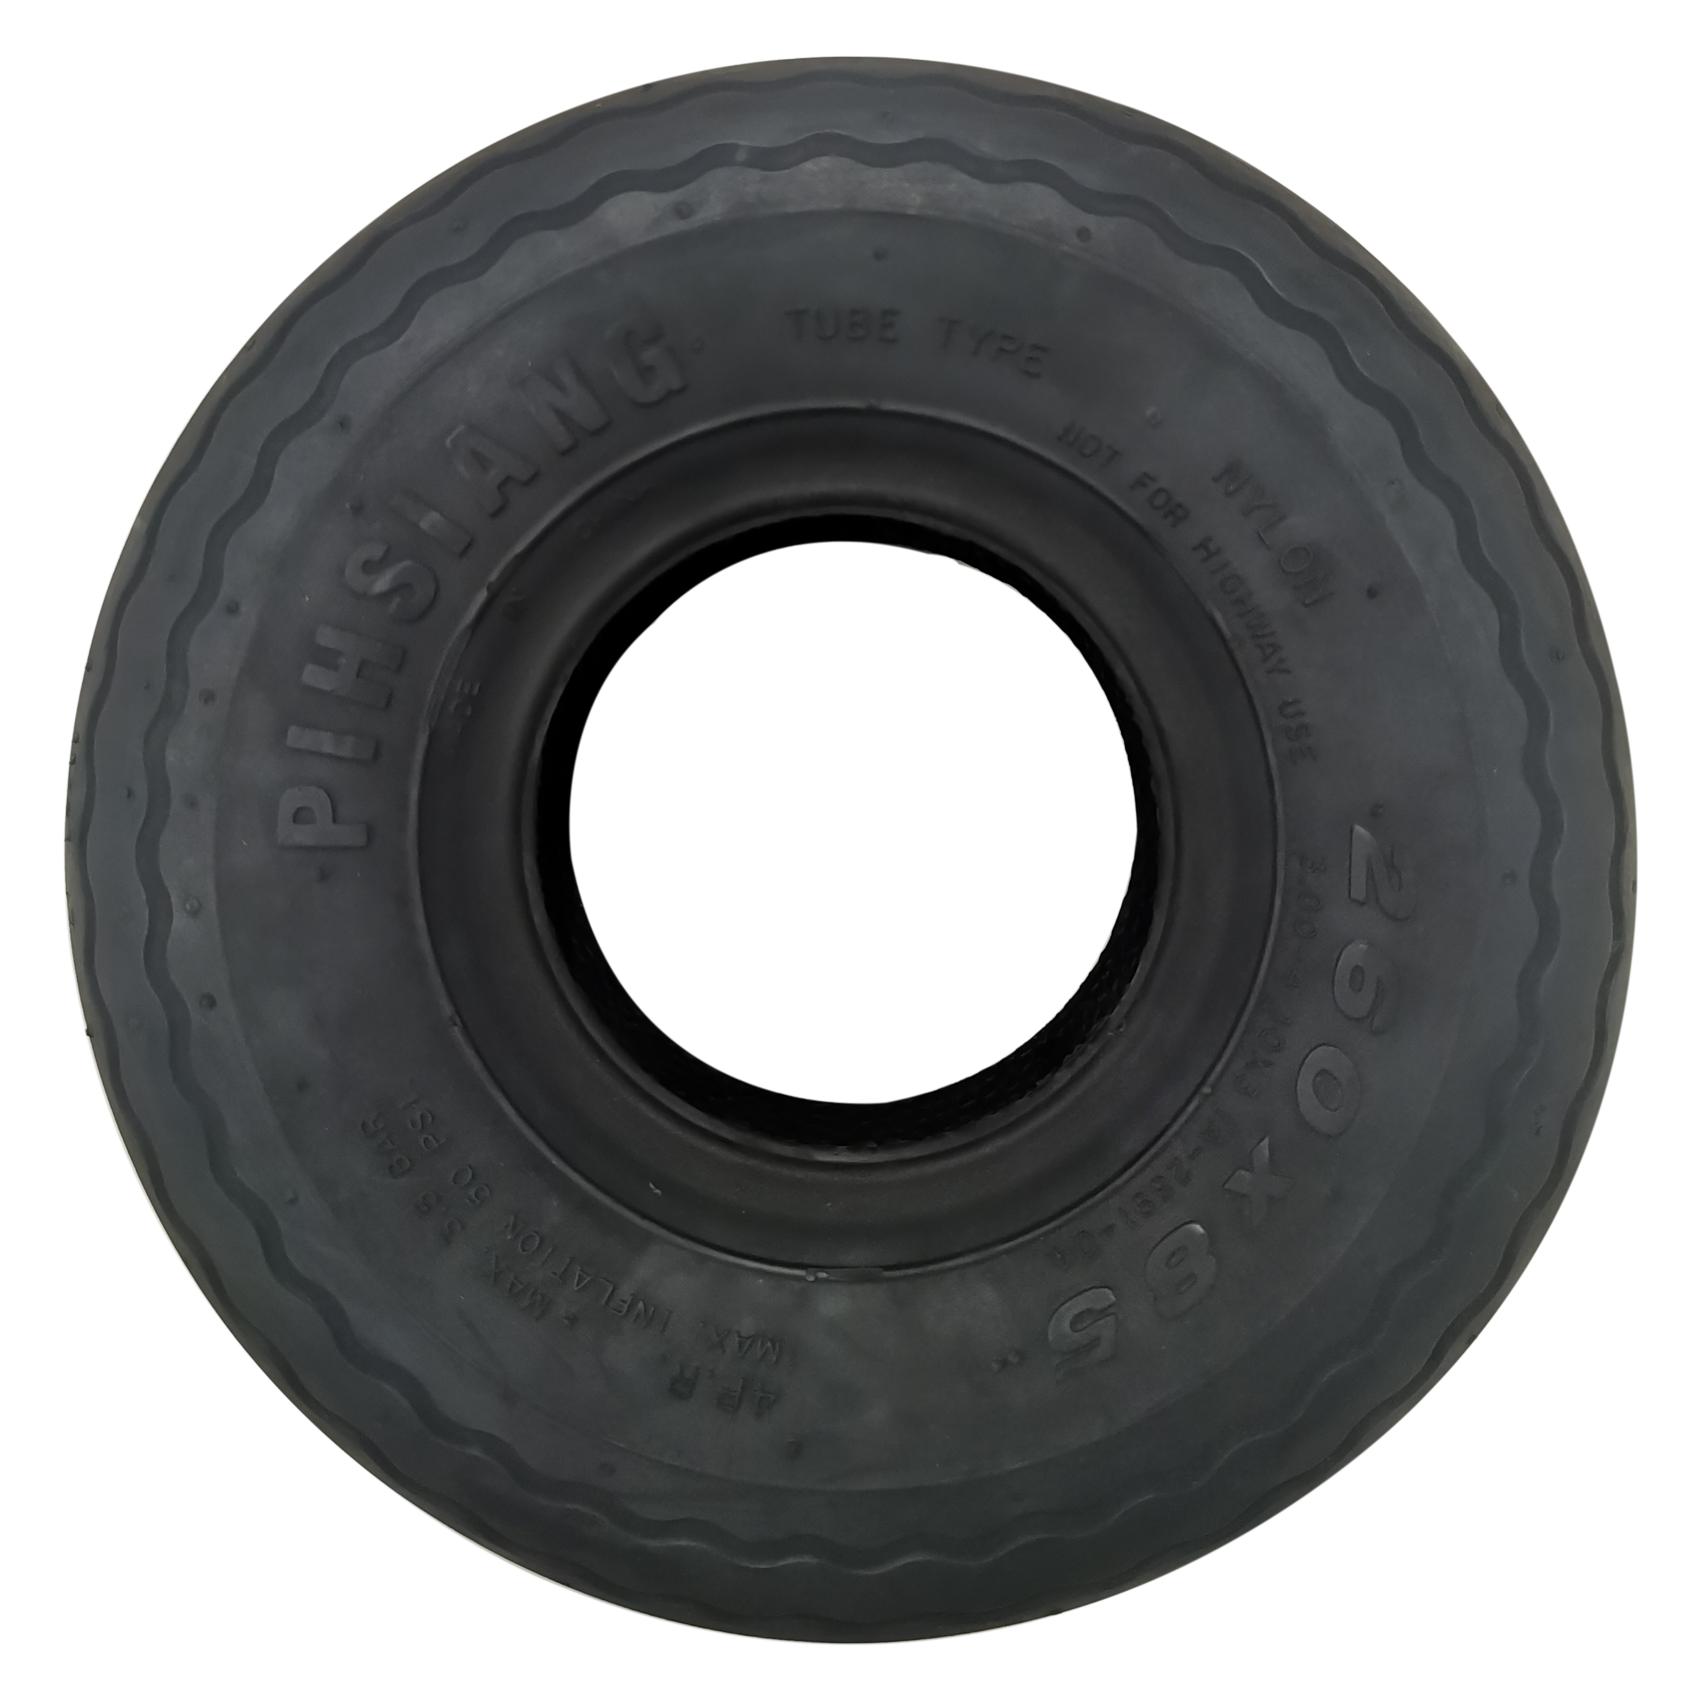 TYRE, 888 FRONT (260 X 85) BLACK